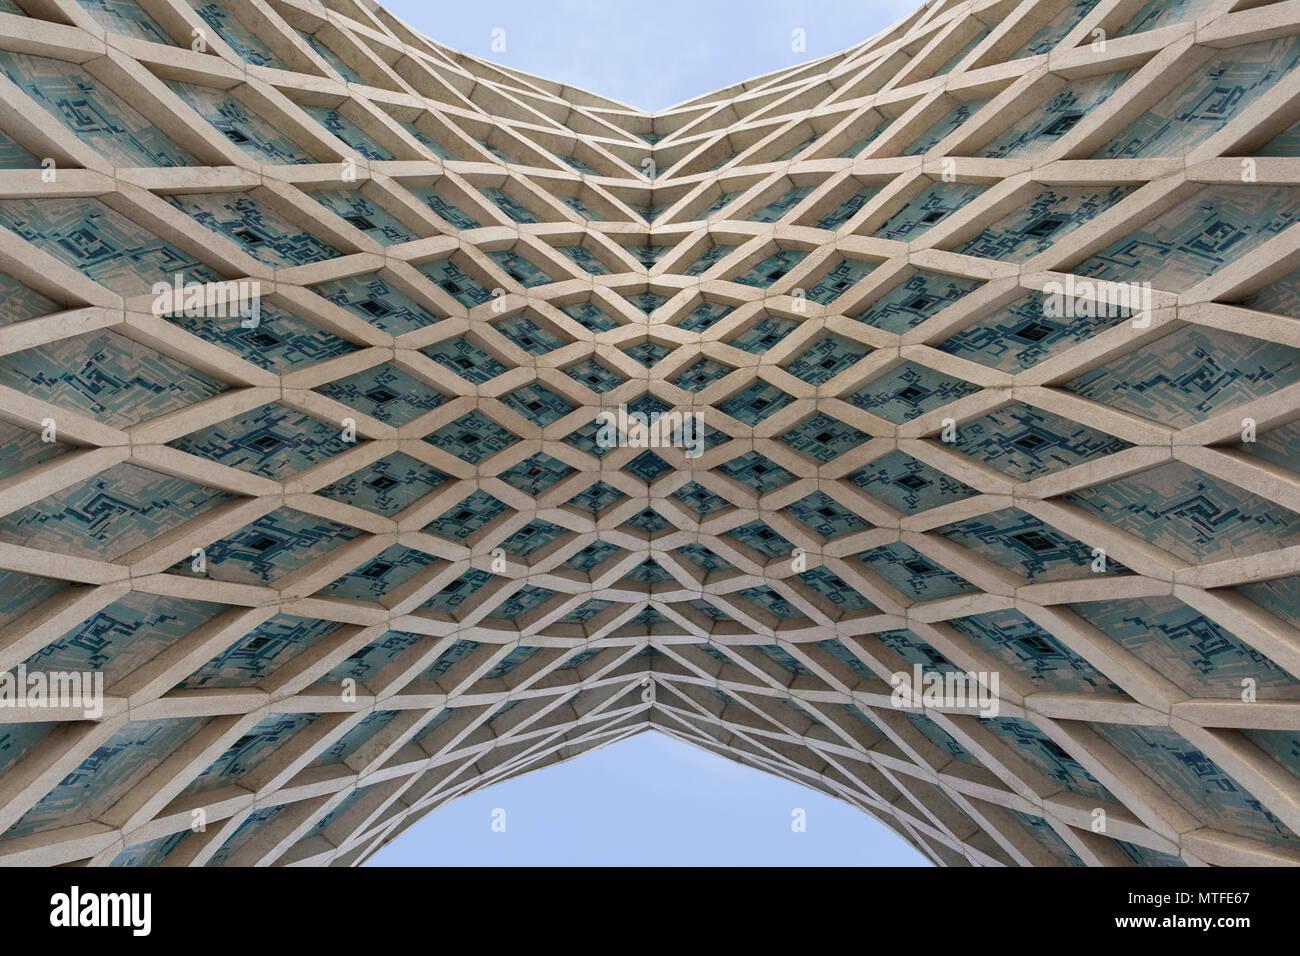 Teheran, Iran - 7 Mai 2018 Top Teil Azadi Turm Tore detail verbunden Brücke, islamischen Muster Architektur. Stockbild